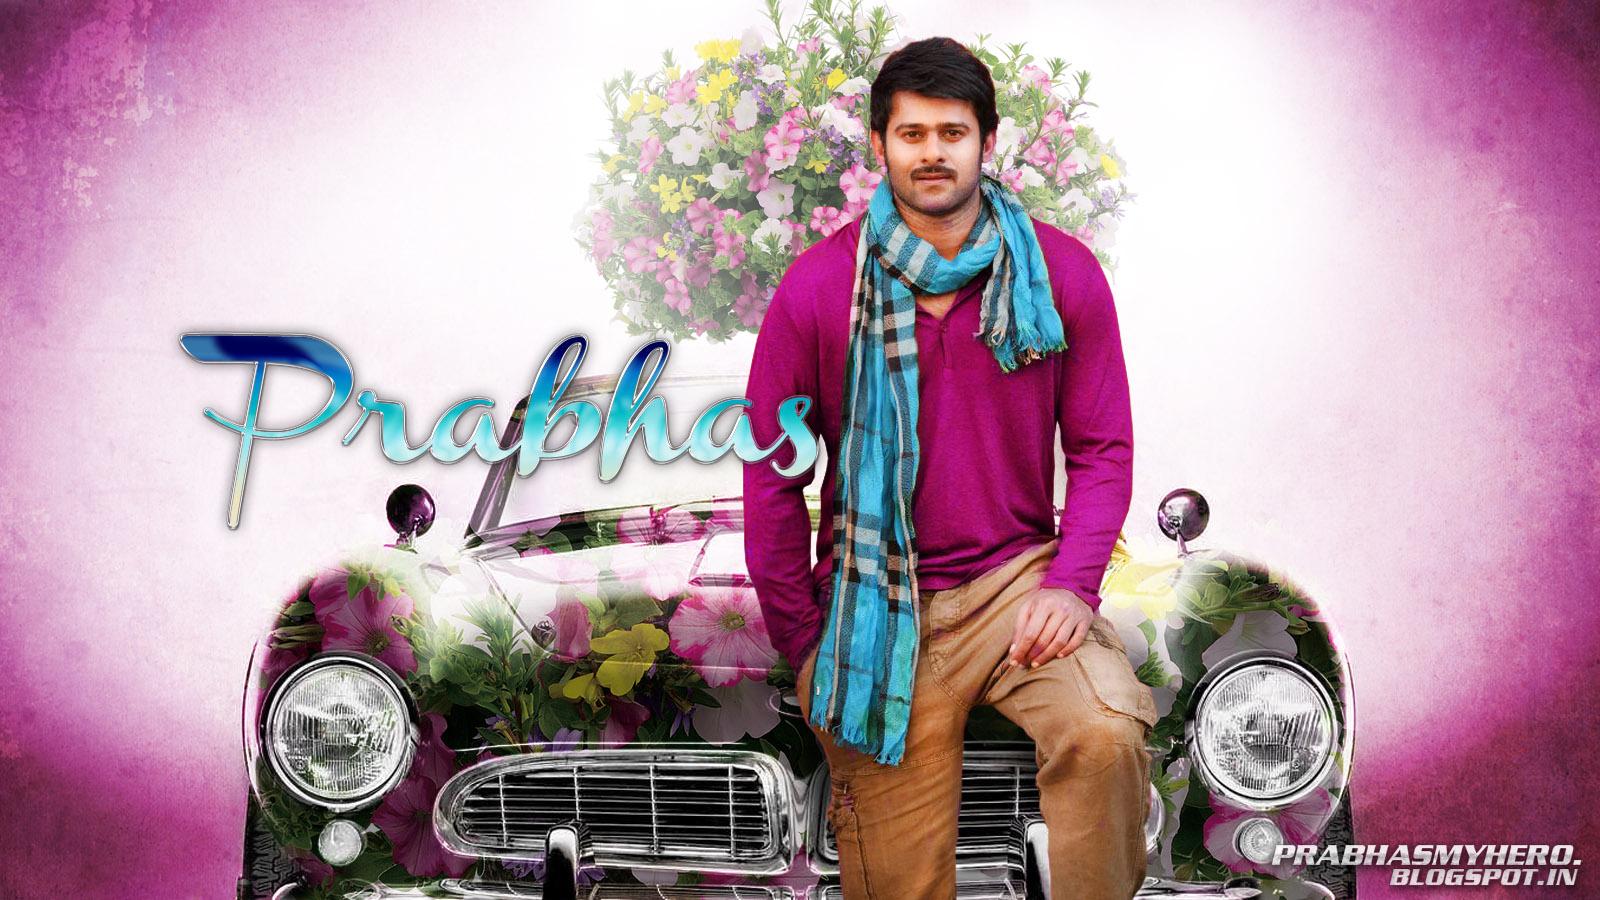 Prabhas Hd Images New: Prabhas HD Wallpapers